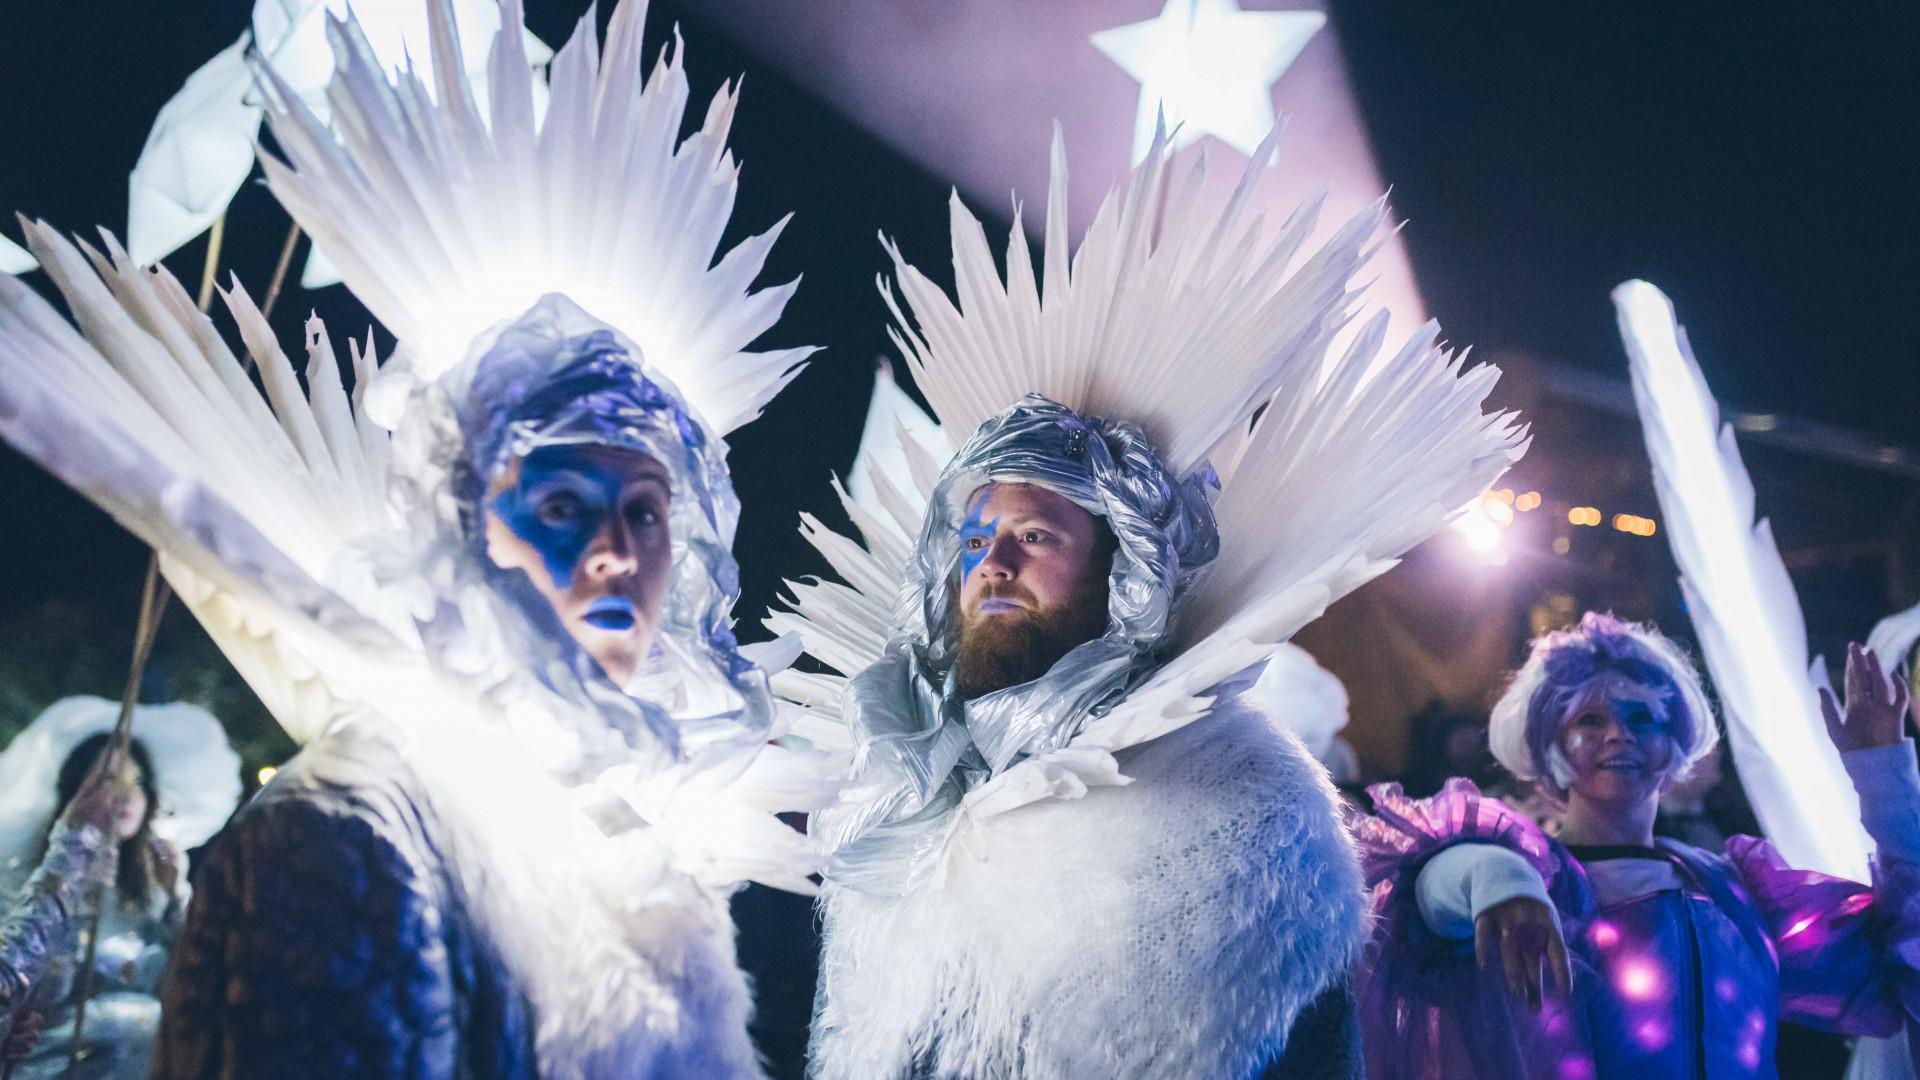 An illuminated procession at Festival No.6 2017